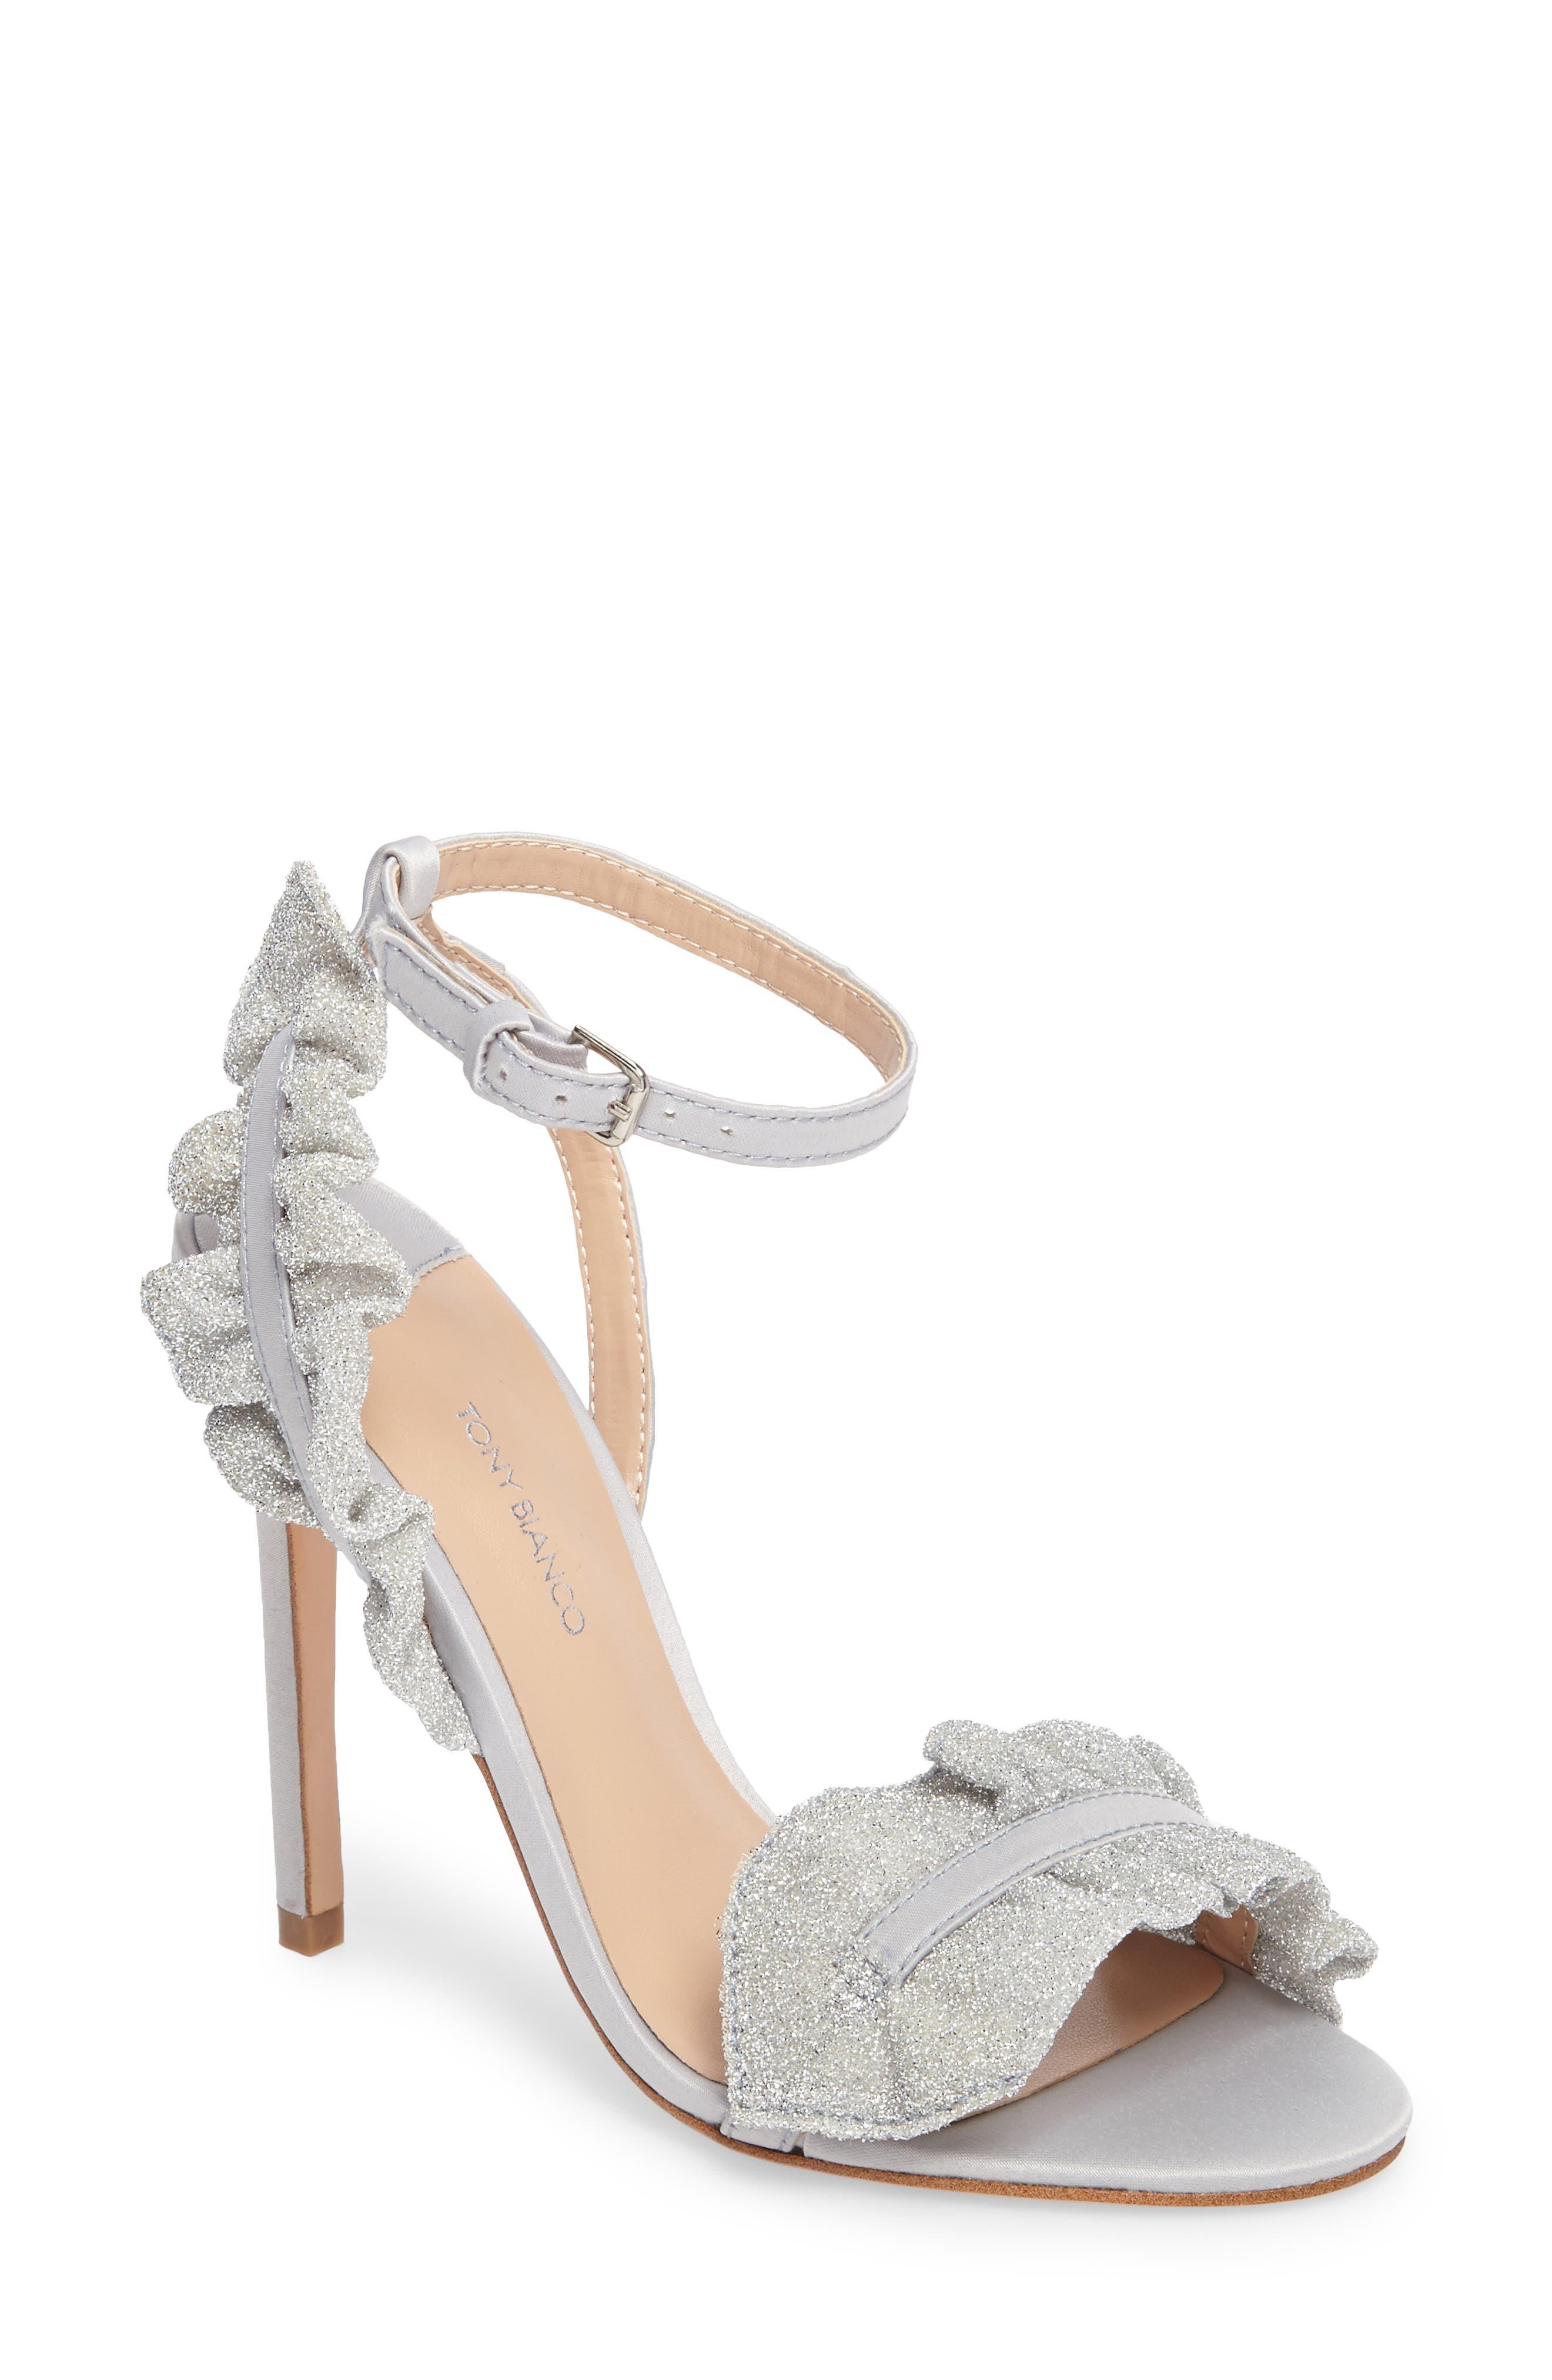 Alternate Image 1 Selected - Tony Bianco Katy Ruffle Sandal (Women)